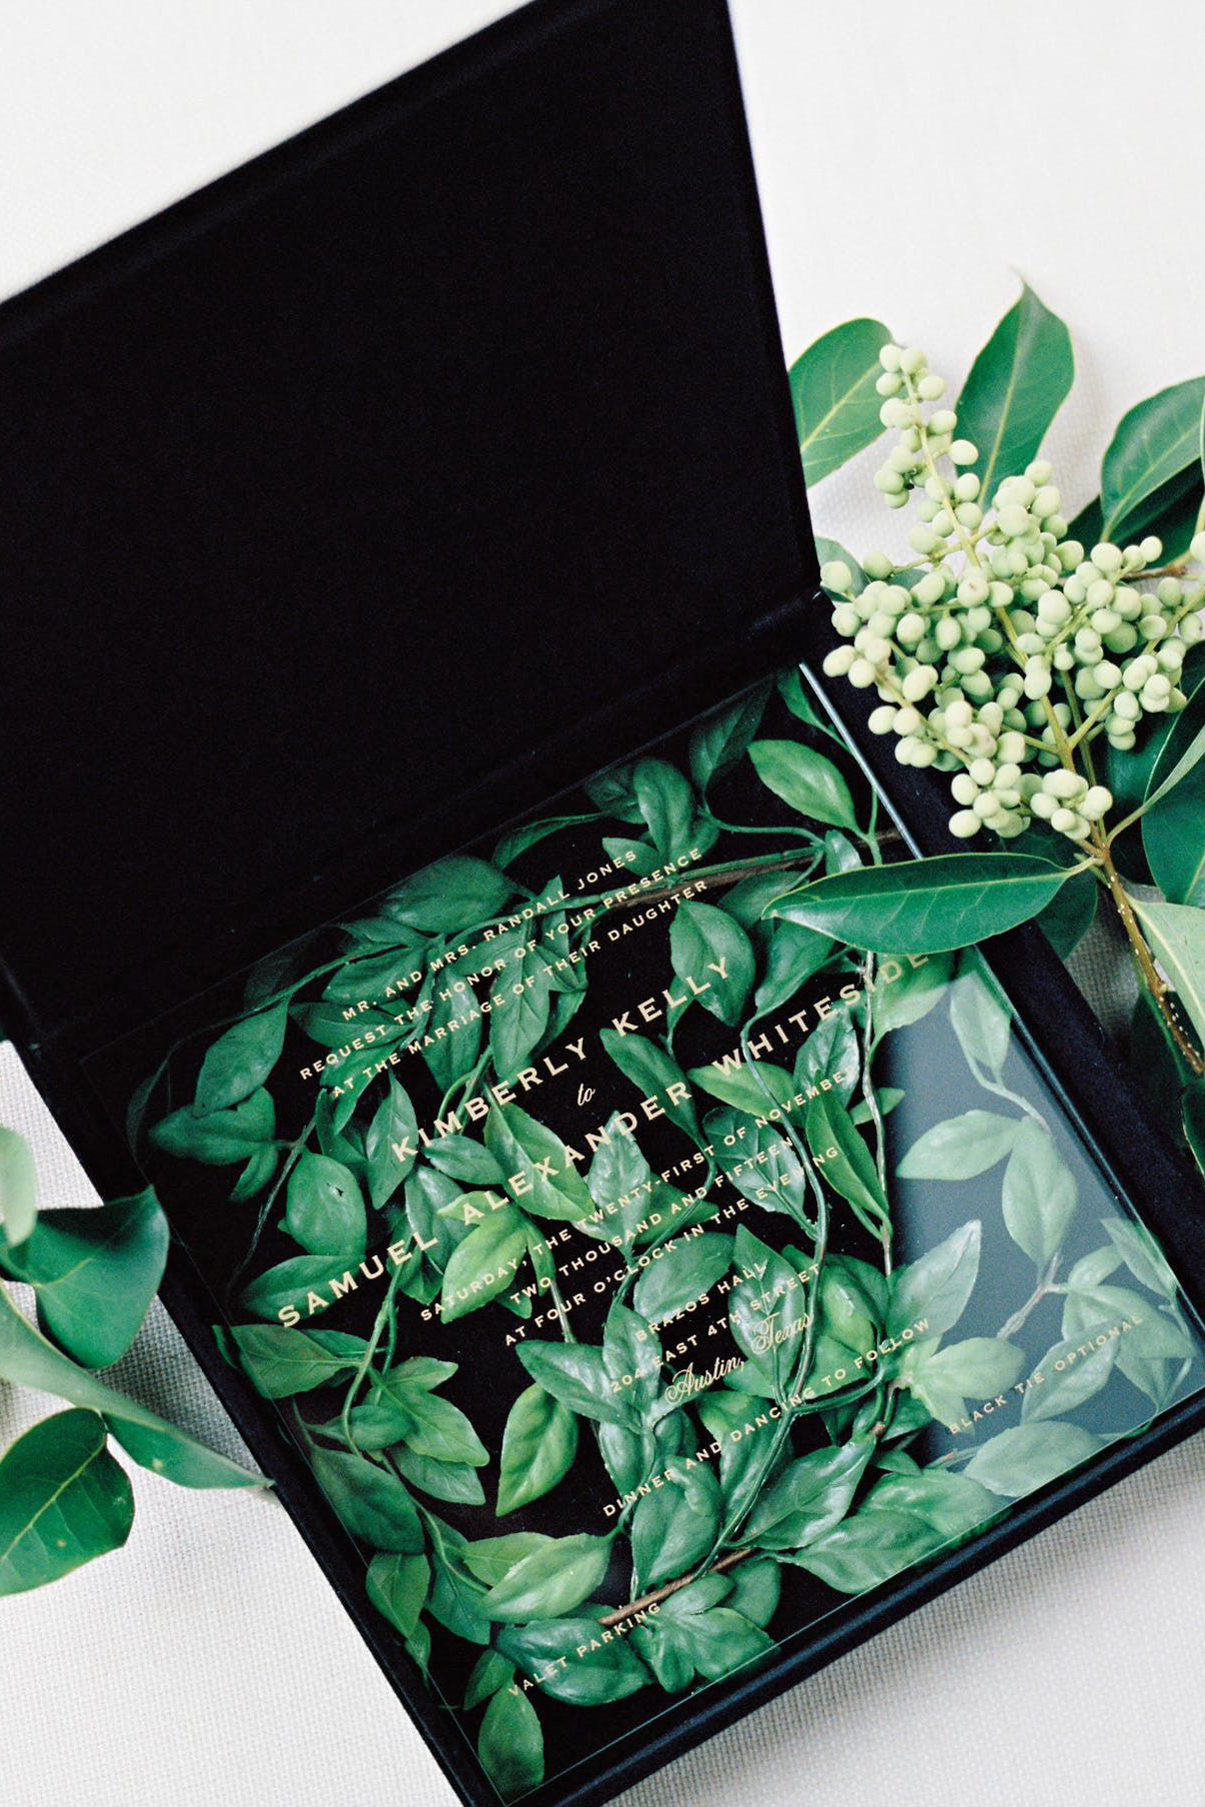 Make Happy Memories Greenery Invite2